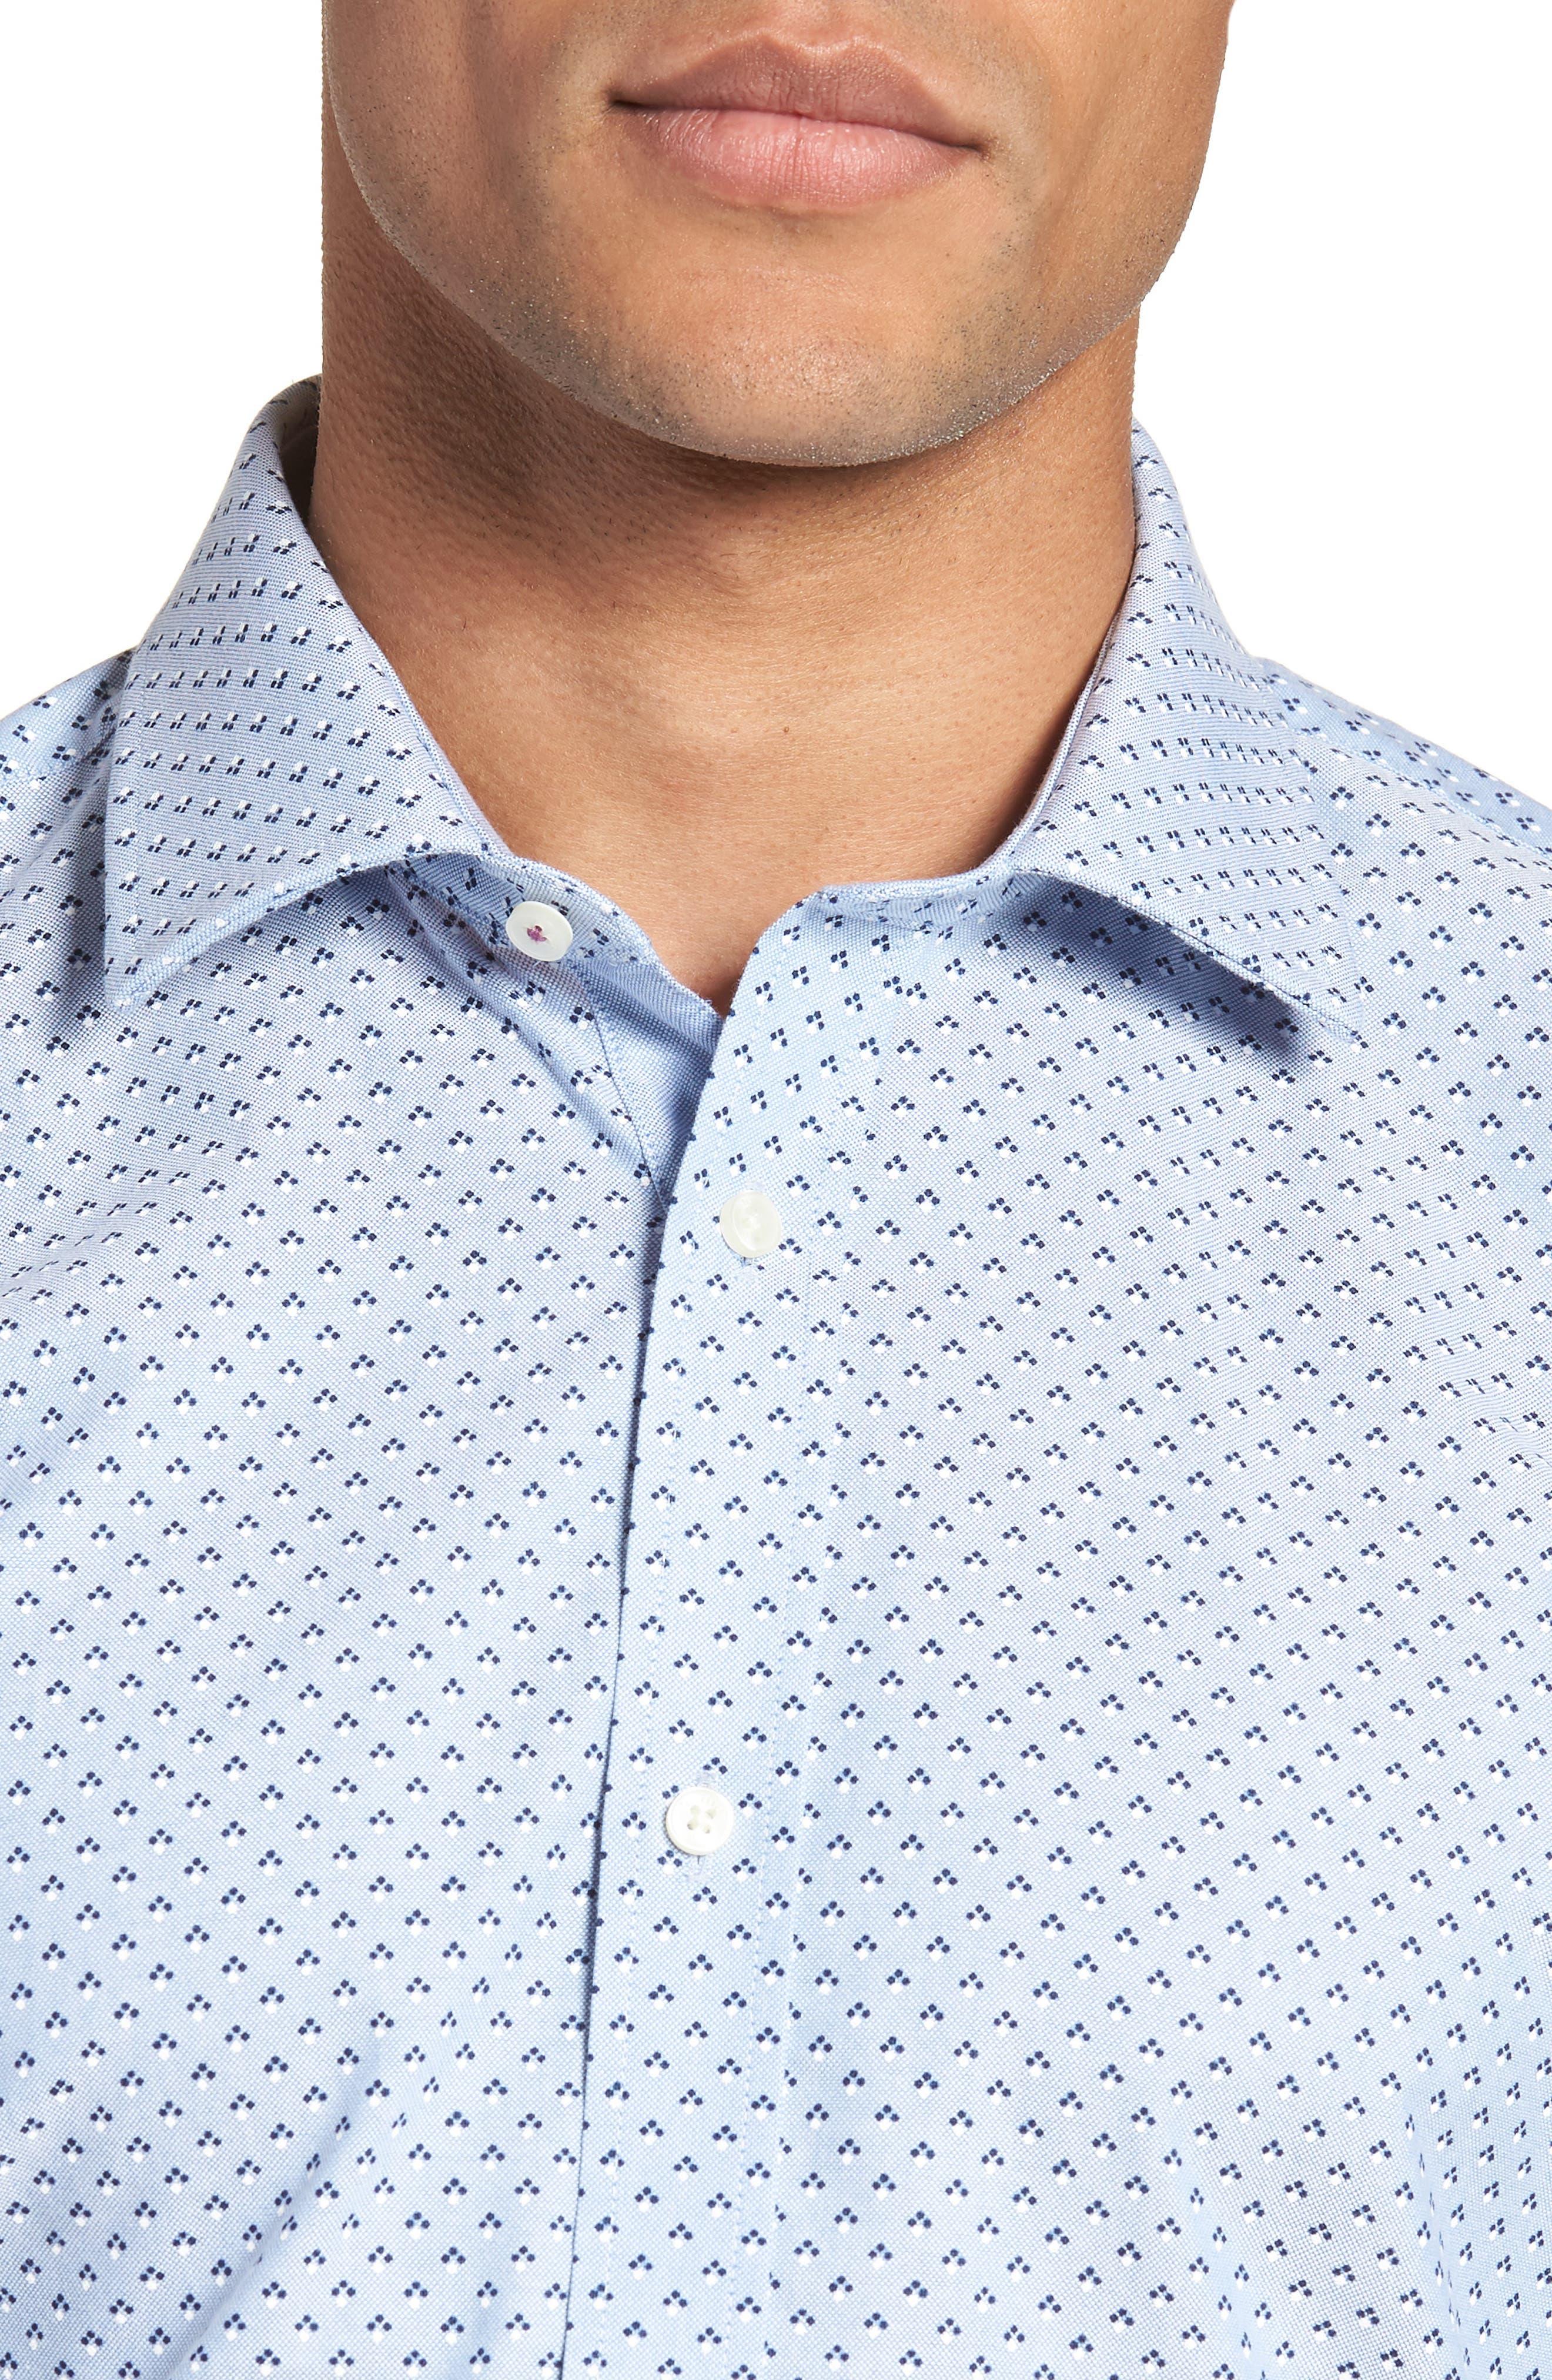 Forestr Trim Fit Geometric Dress Shirt,                             Alternate thumbnail 2, color,                             421